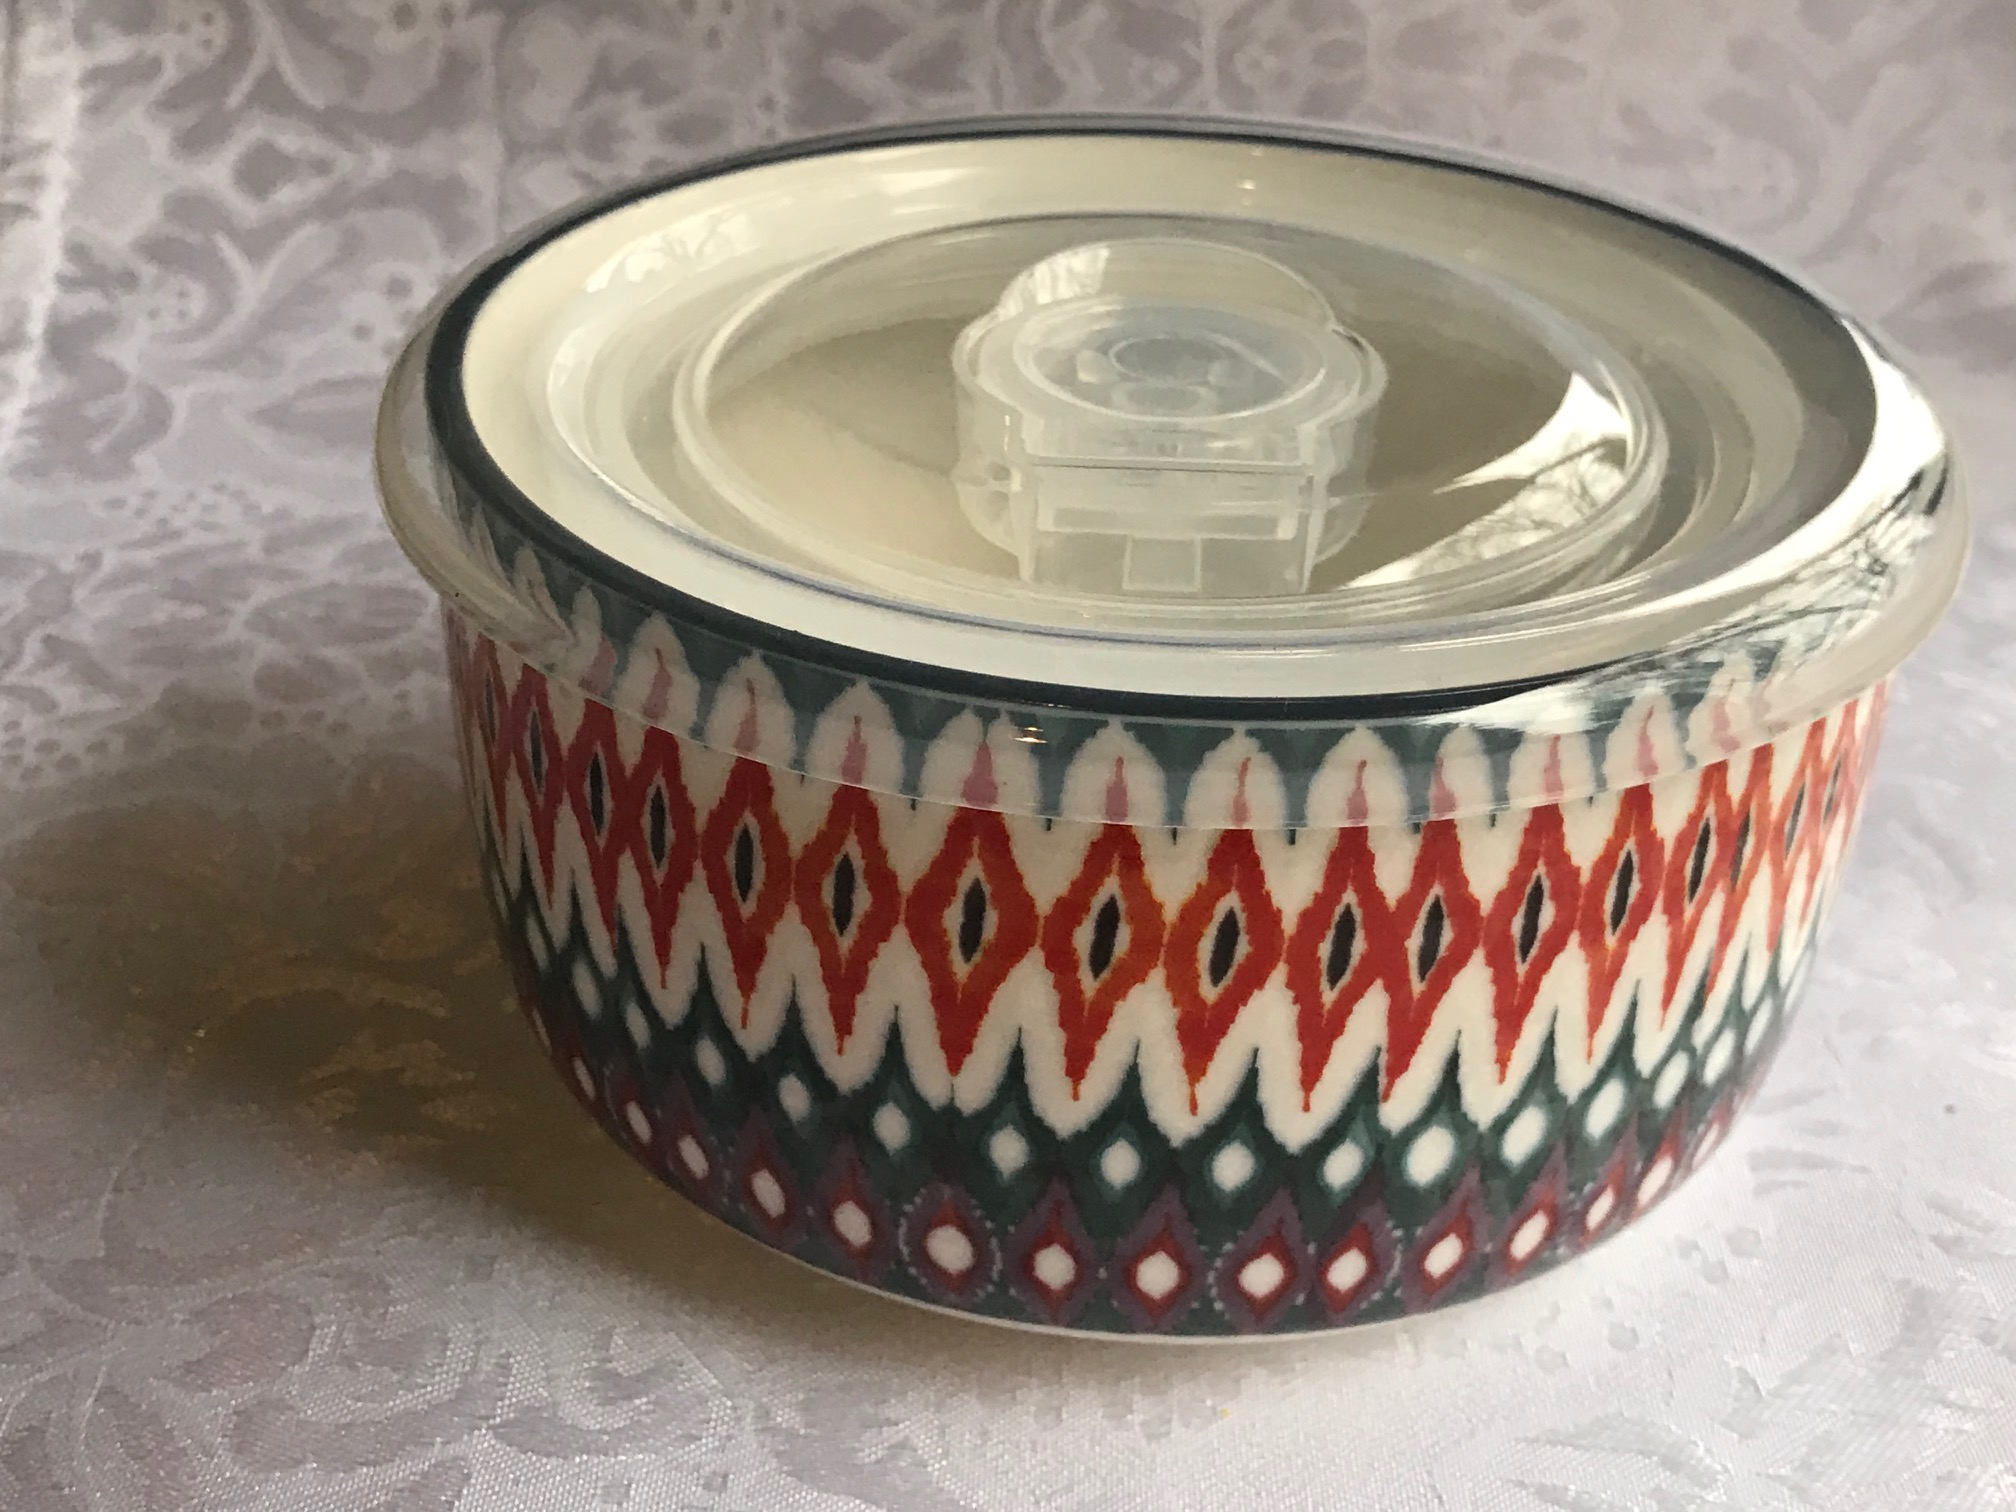 Signature Housewares Incorporated Ceramic Food Storage Container: 2,107 ppm Lead.